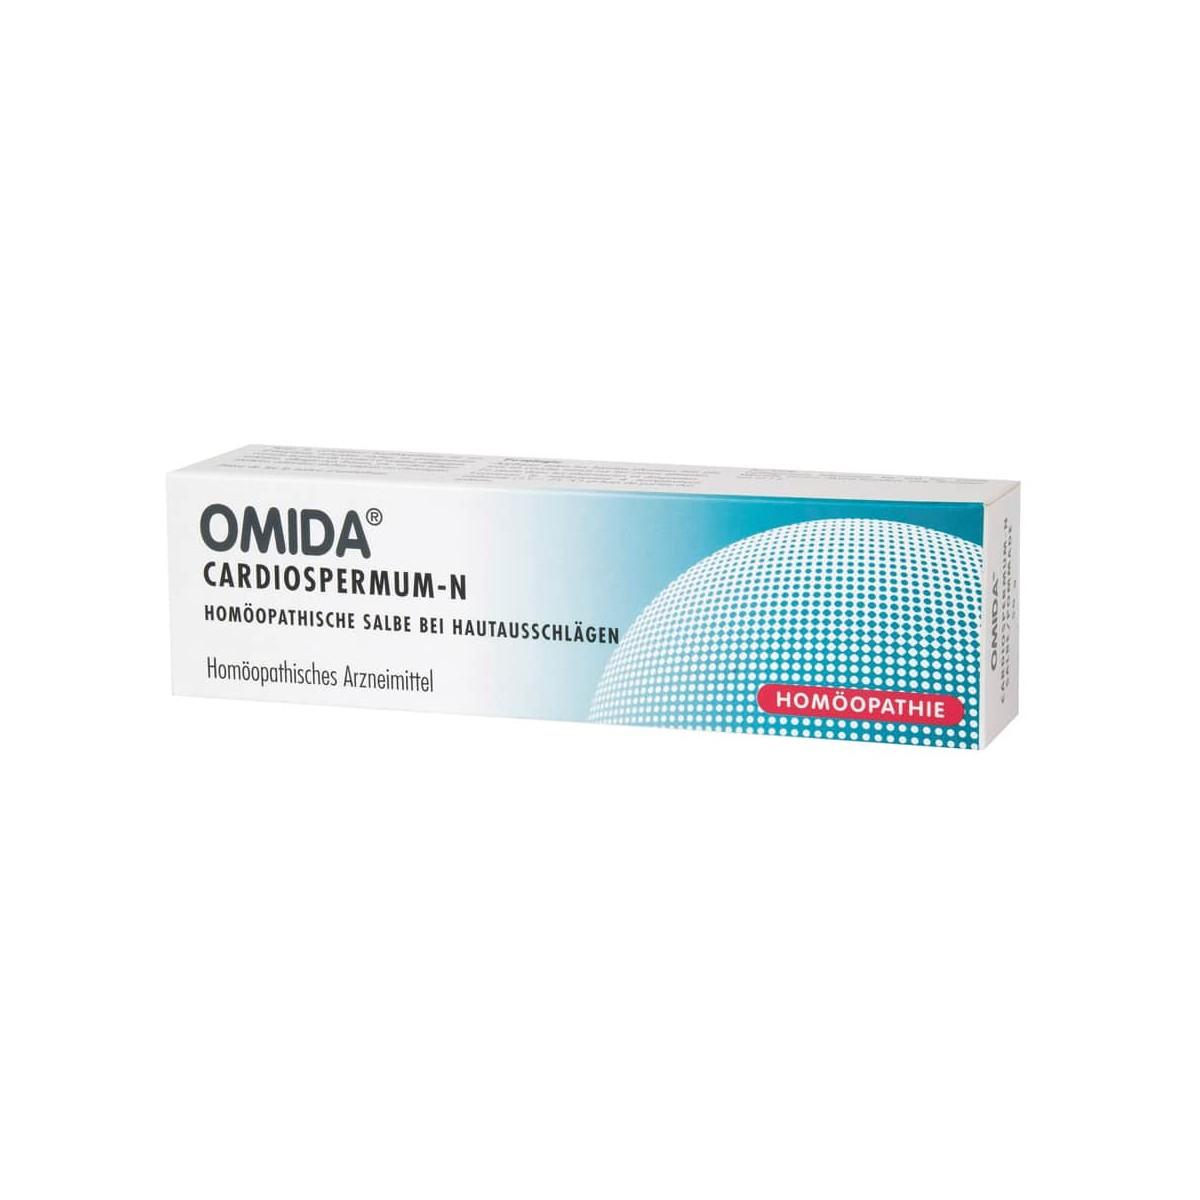 Omida Cardiospermum-N Salbe 50 g